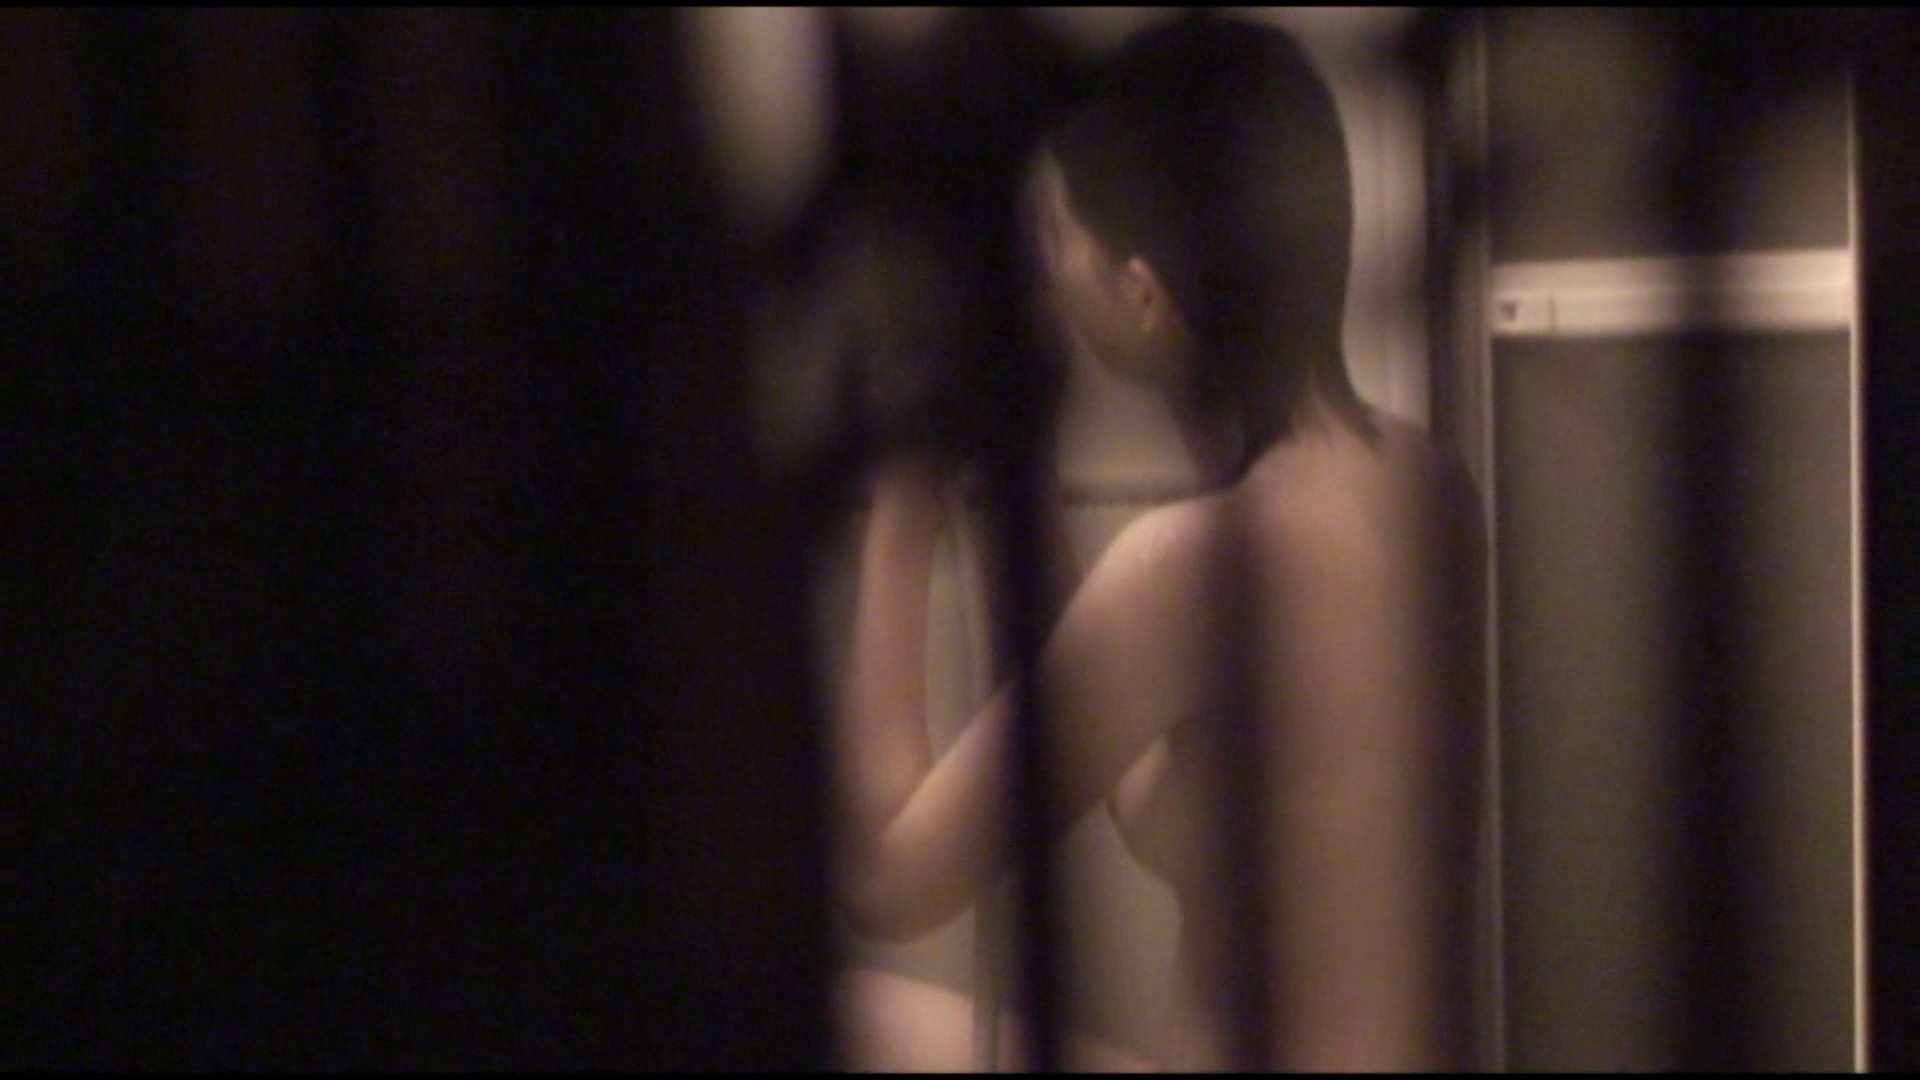 vol.05最高の極上美人!可愛い彼女の裸体をどうぞ!風呂上り鏡チェックも必見! 美人  68pic 47